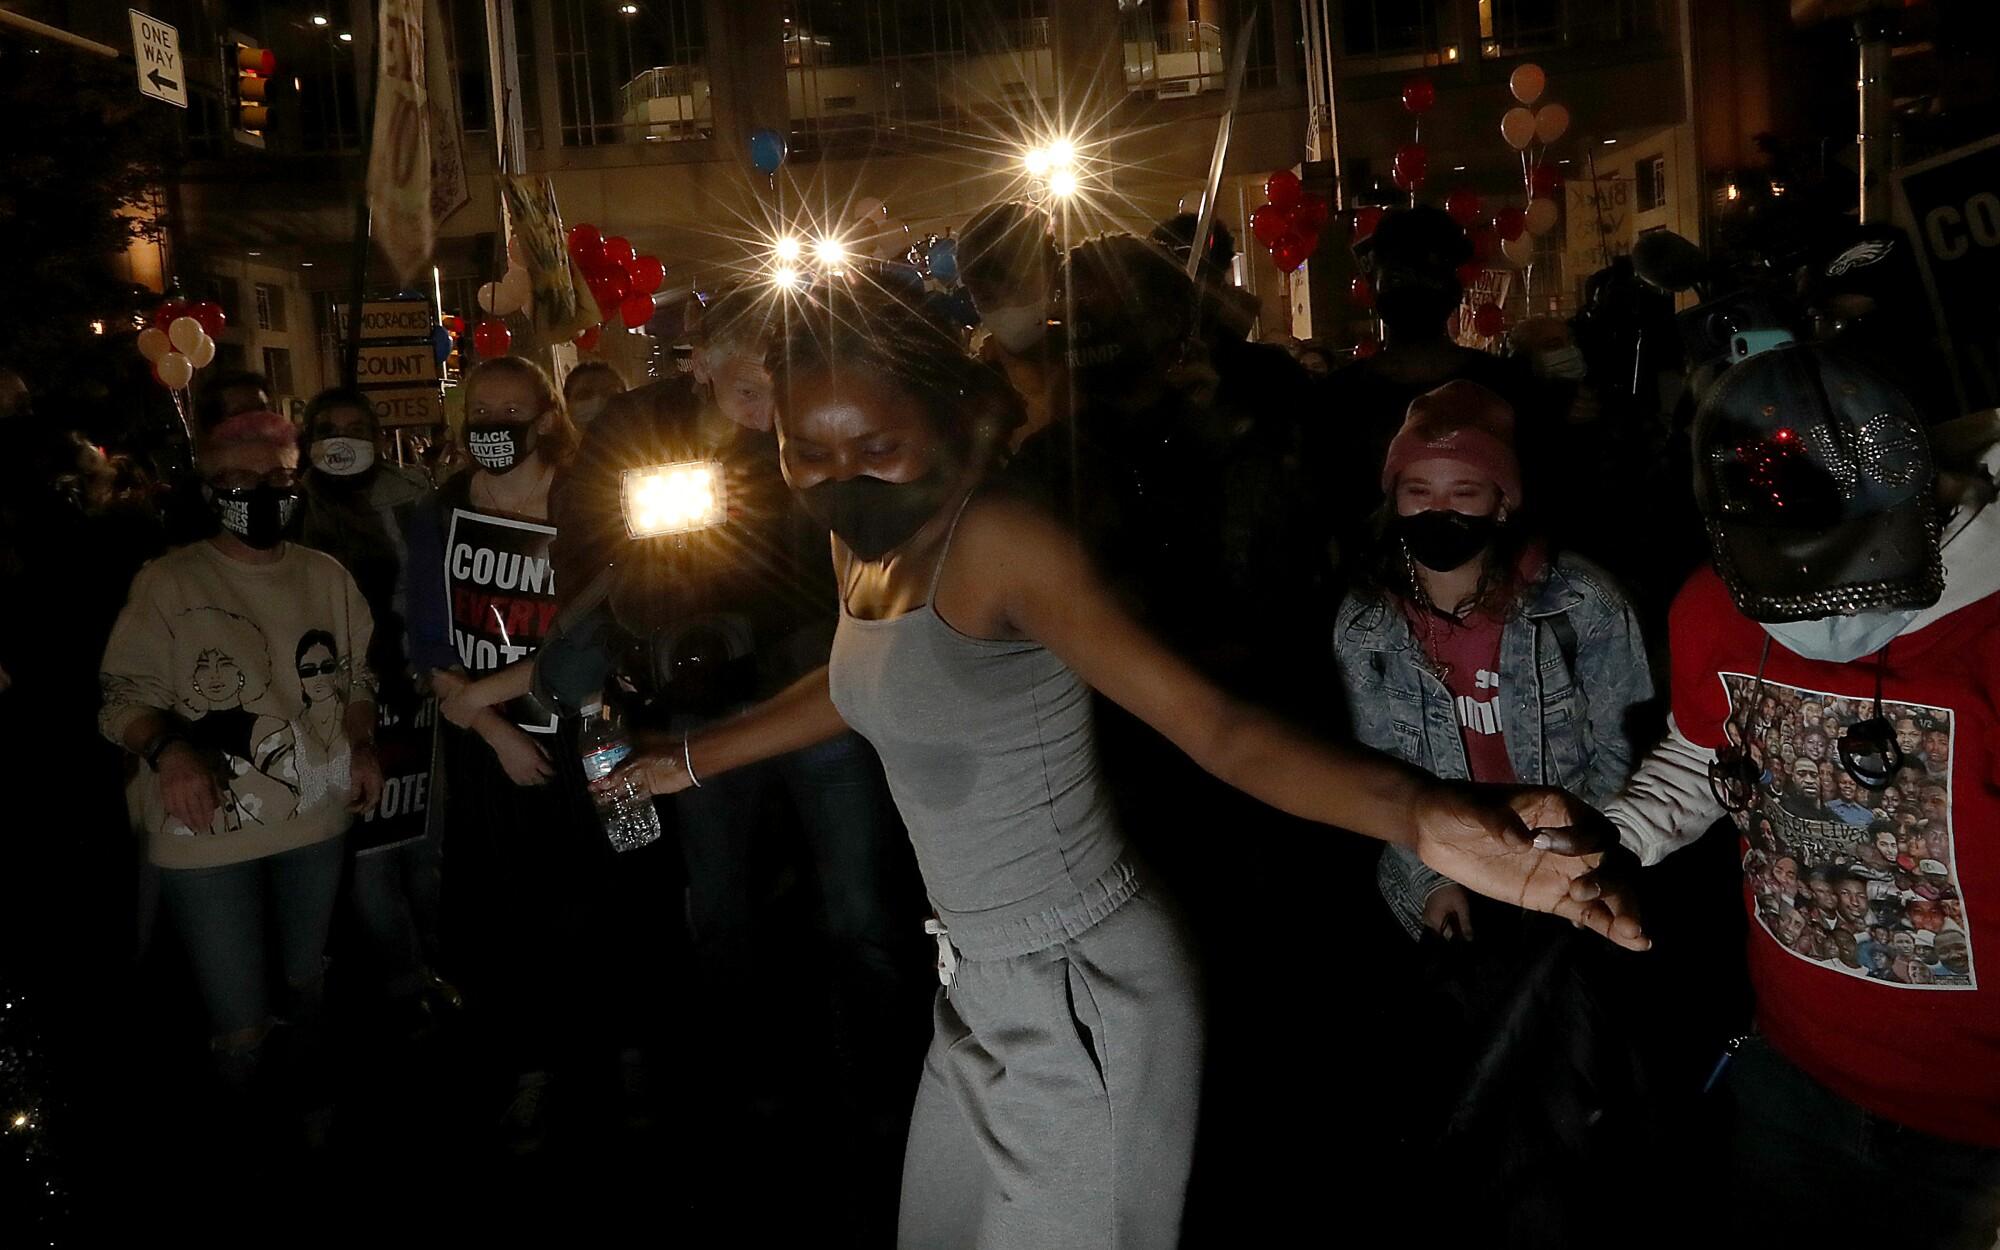 Protesters dance in the dark